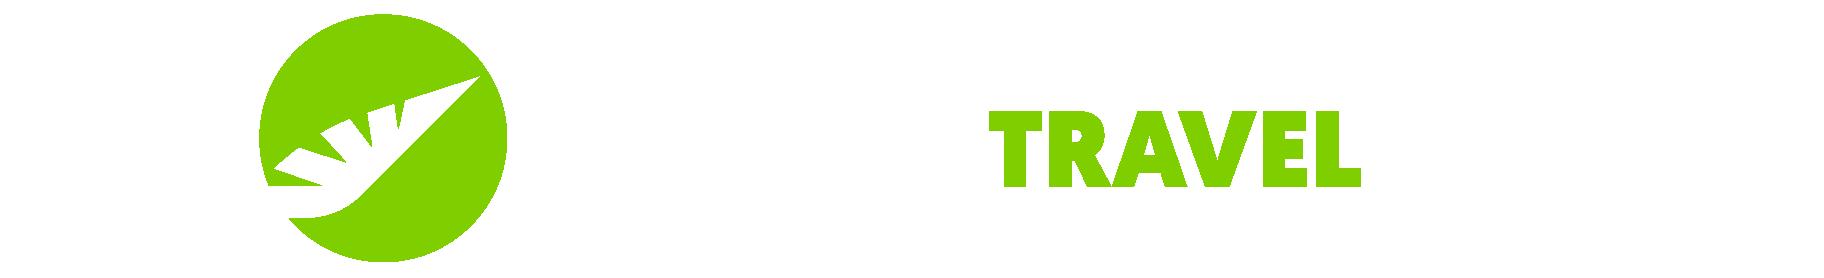 Footer-logo@3x.png